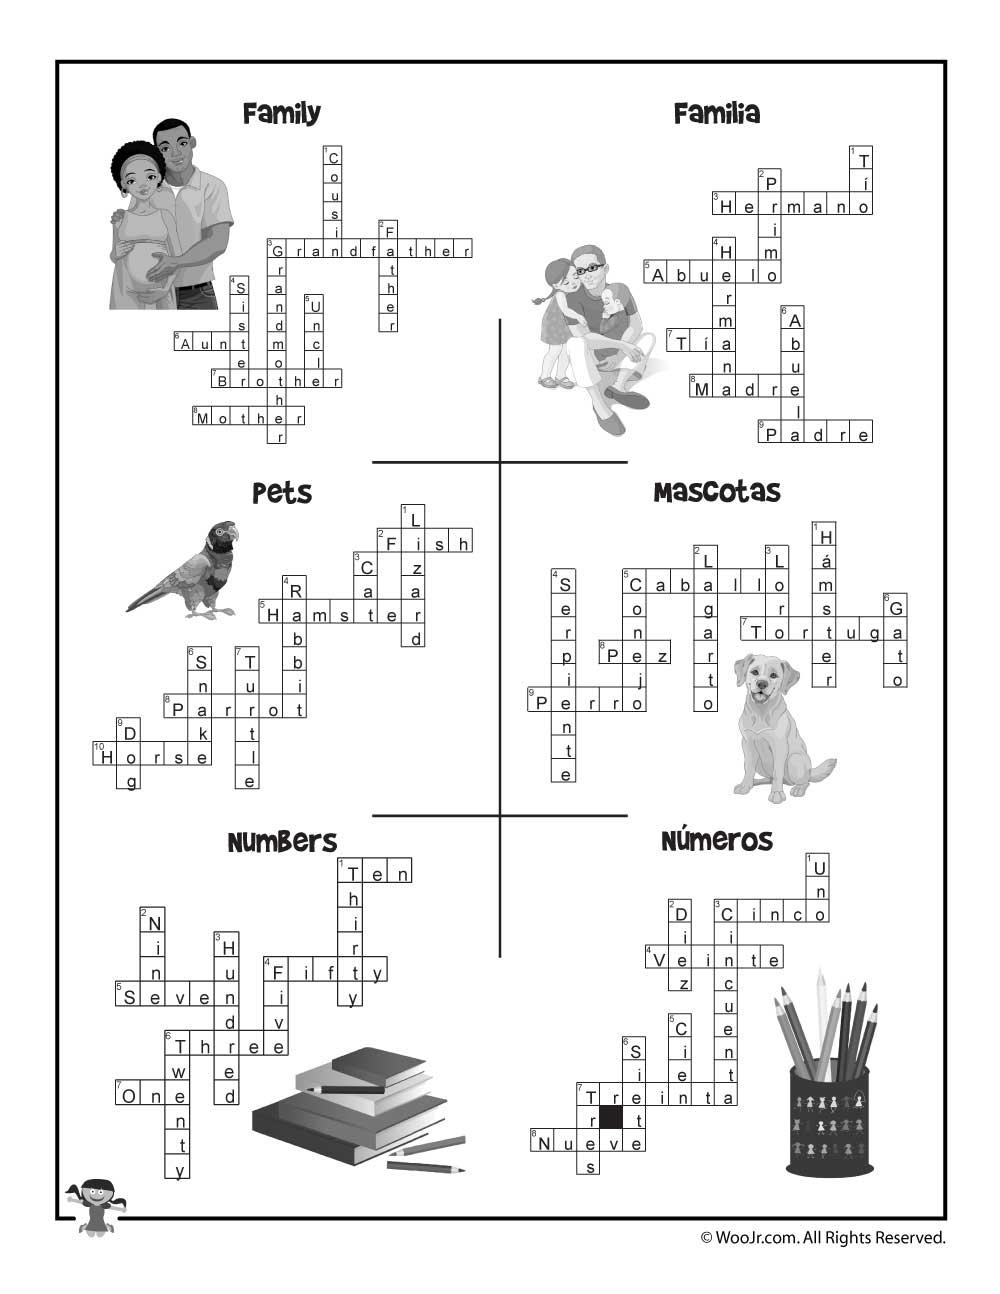 Esl Worksheet Crossword Puzzle Answers | Woo! Jr. Kids Activities - Printable Spanish Crossword Puzzle Answers